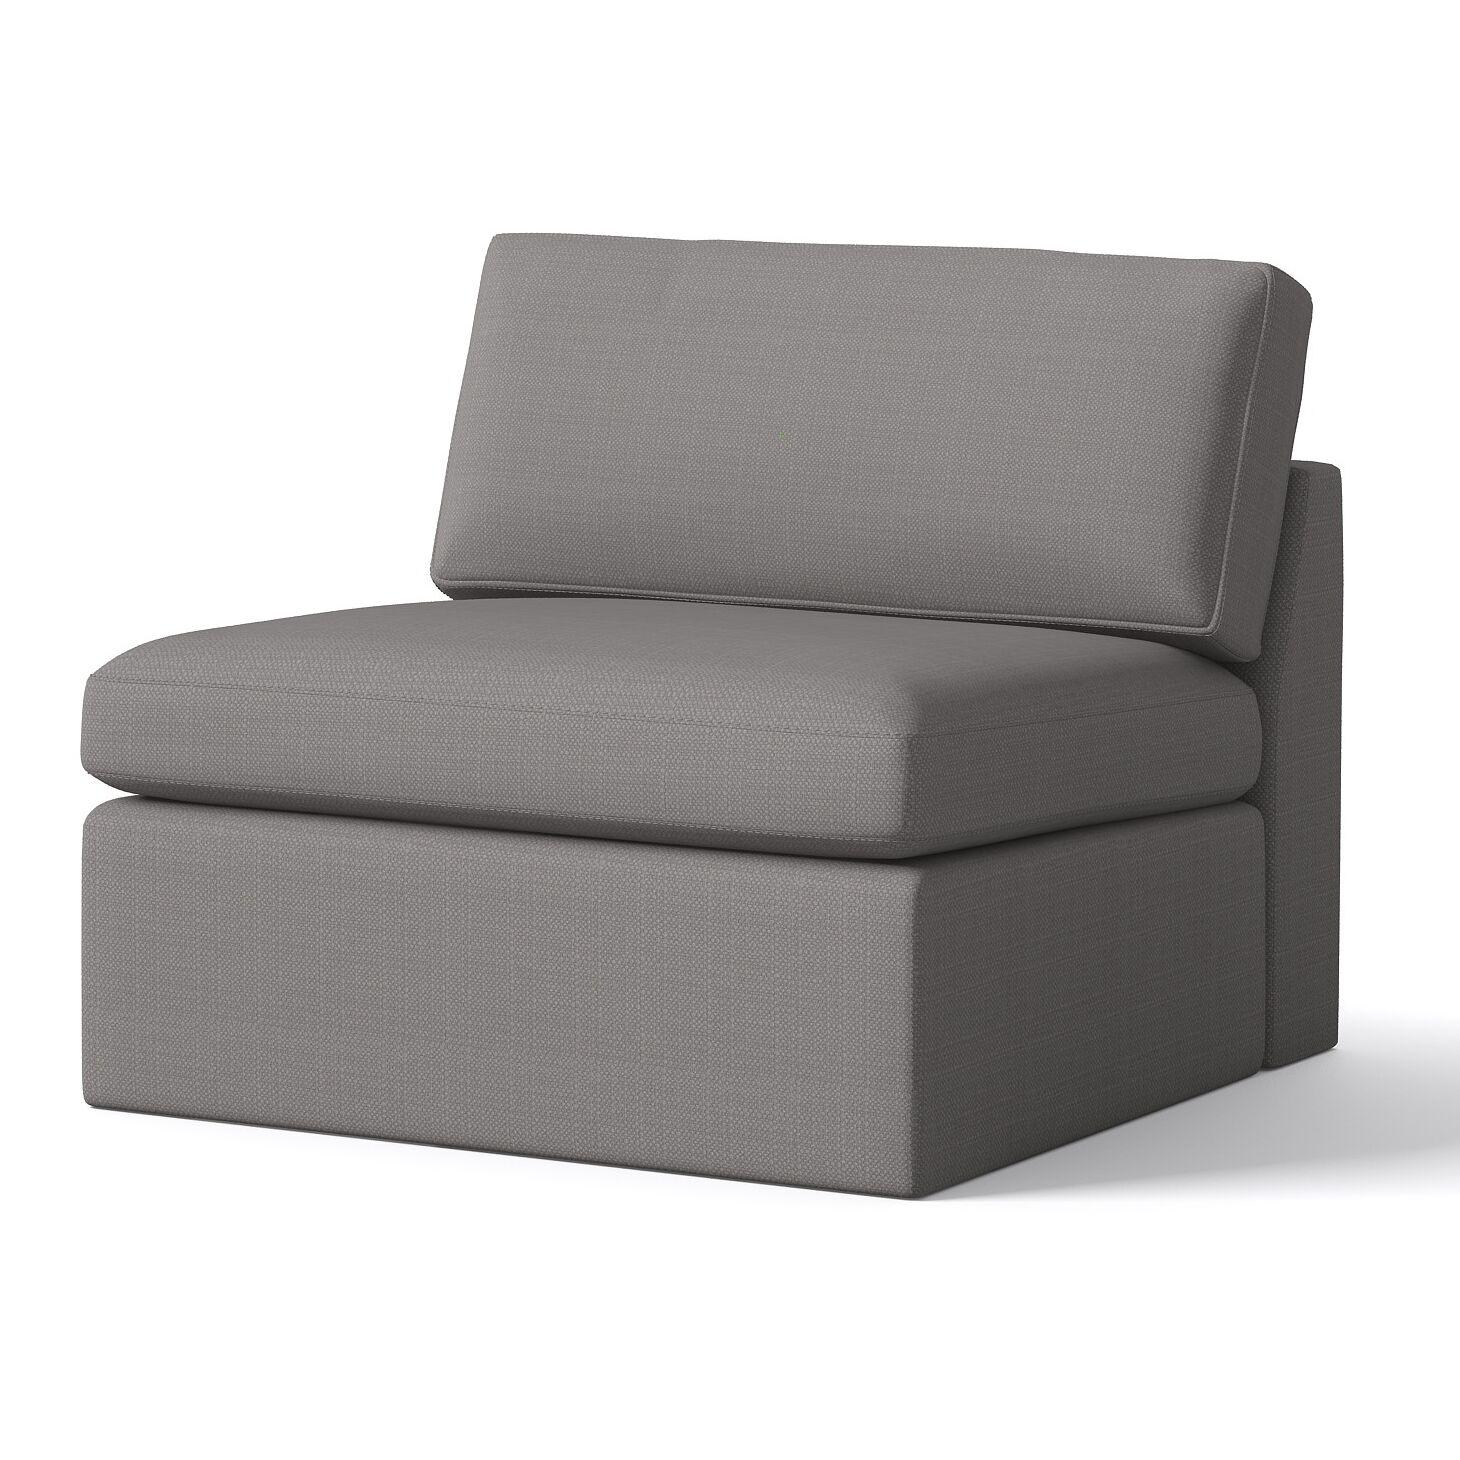 Marfa Armless Chair Body Fabric: Klein Wheatgrass